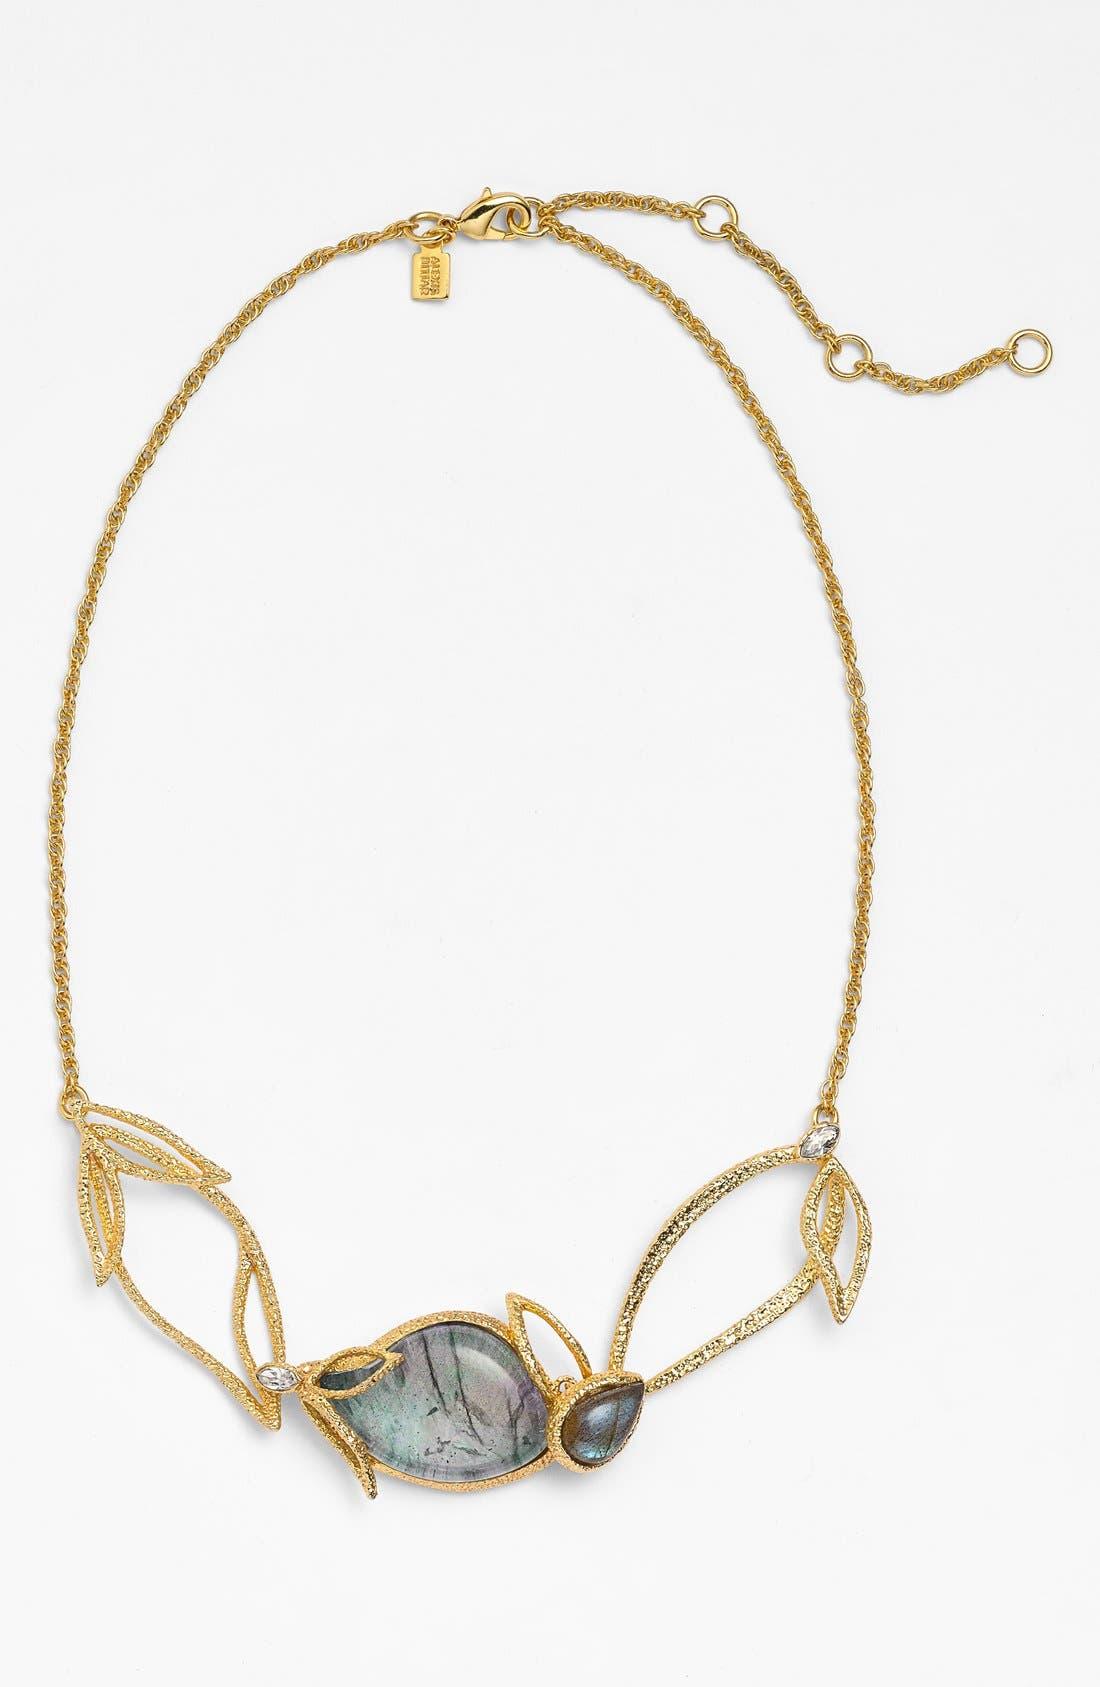 Main Image - Alexis Bittar 'Elements' Bib Necklace (Nordstrom Exclusive)